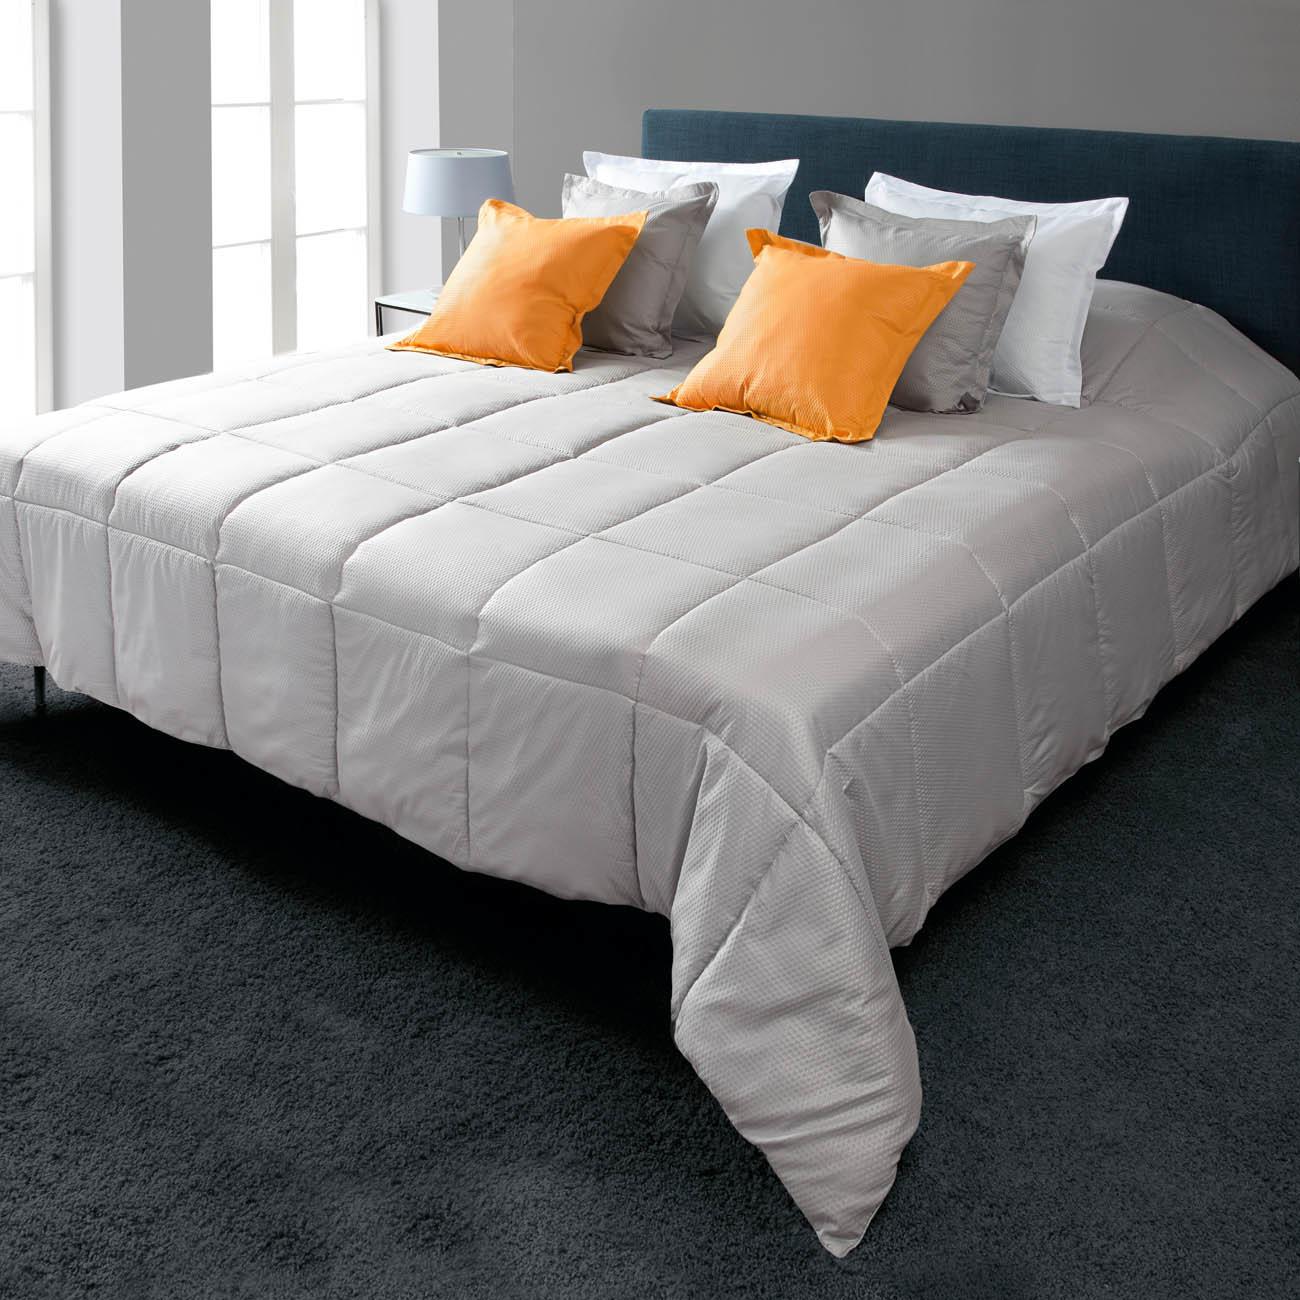 Buy Ultra Light Bed Coverlet Or Pillow Online